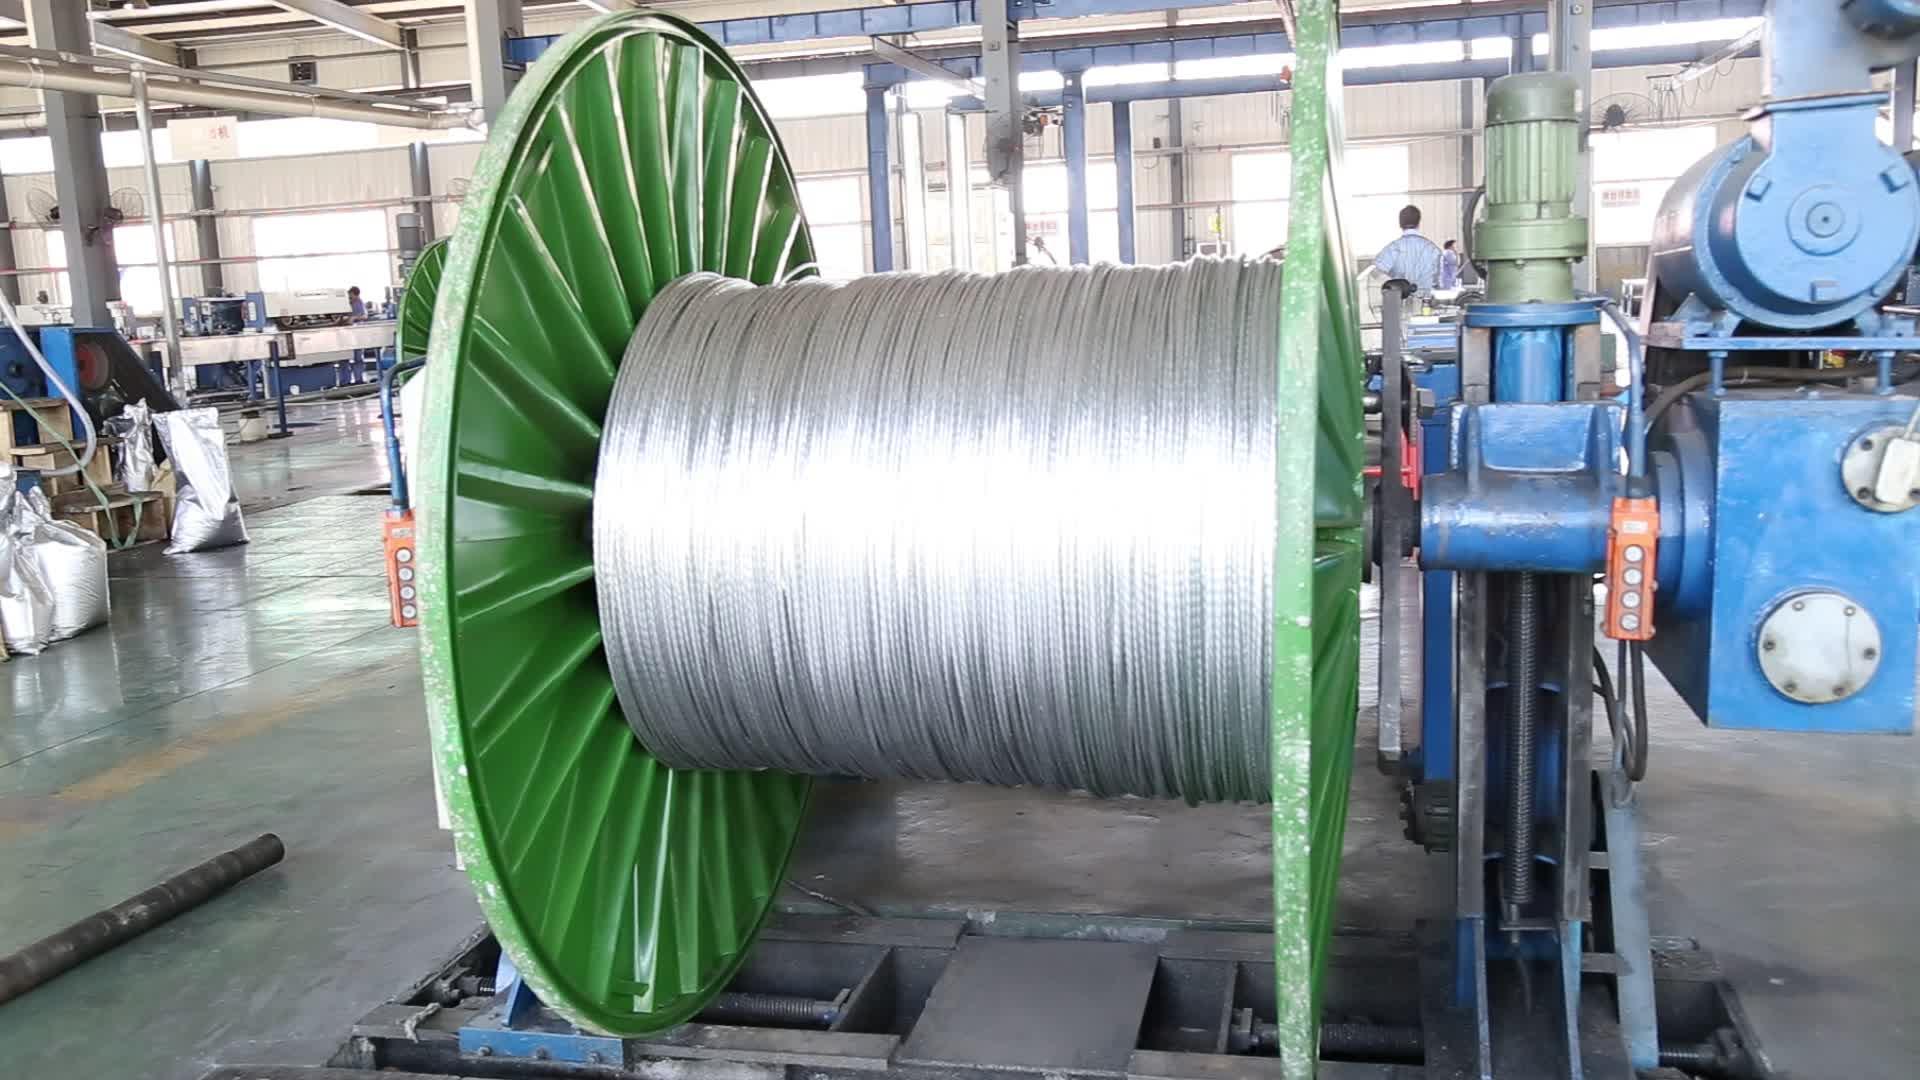 Factory Direct 600V Quadruplex Conductor URD Cable Manufacturer